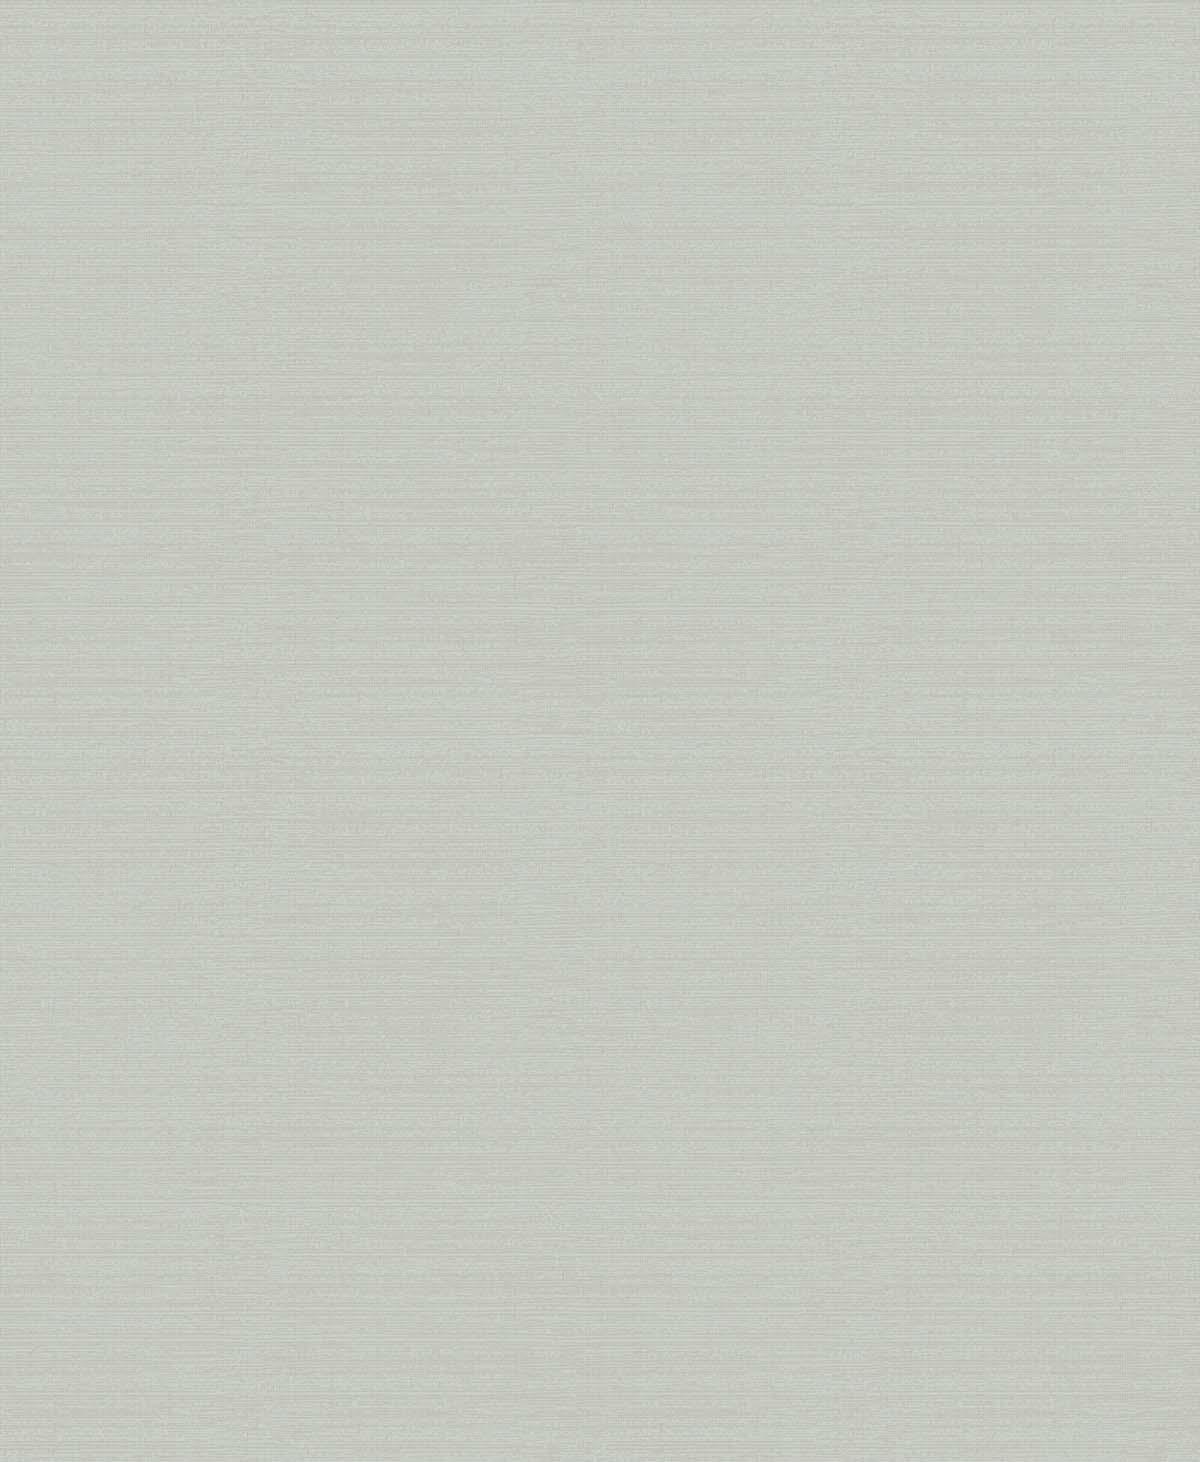 savile-row-wallpaper-melton-silk-SR00514